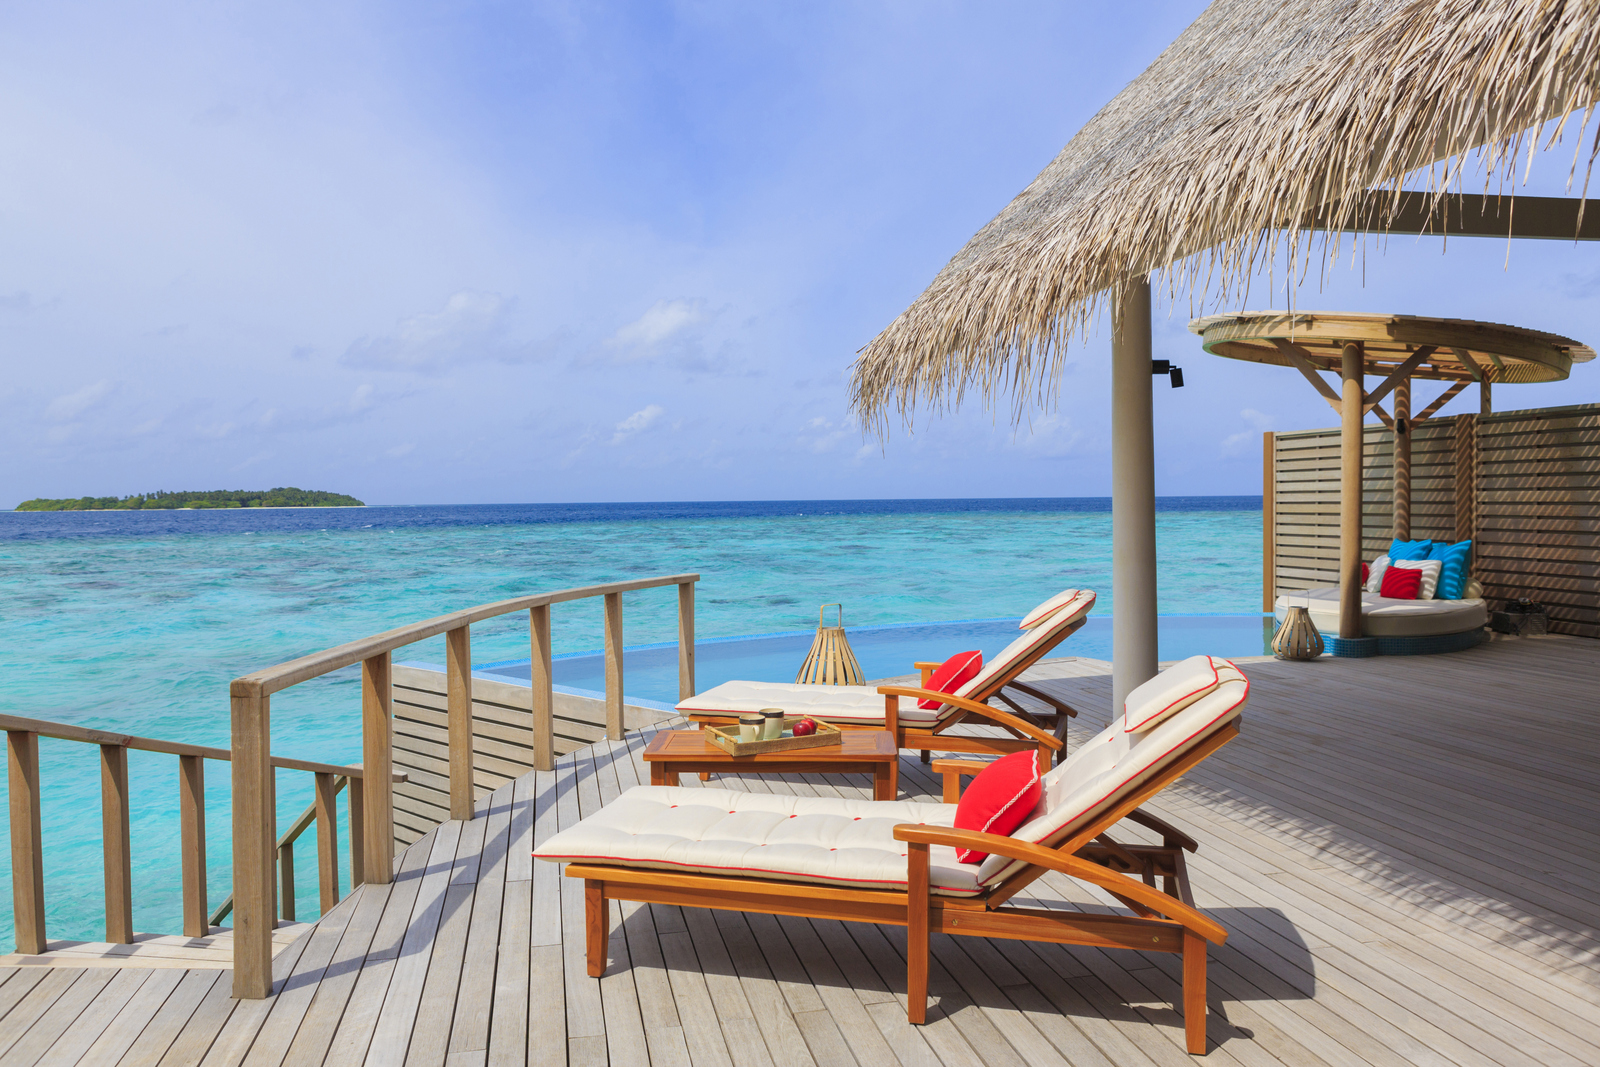 Malediven    die neue Trauminsel Milaidhoo im Baa Atoll strand sonne reisebericht malediven honeymoon 2  TUI Berlin Reisebüro Malediven Milaidhoo Sonnendeck Poolvilla